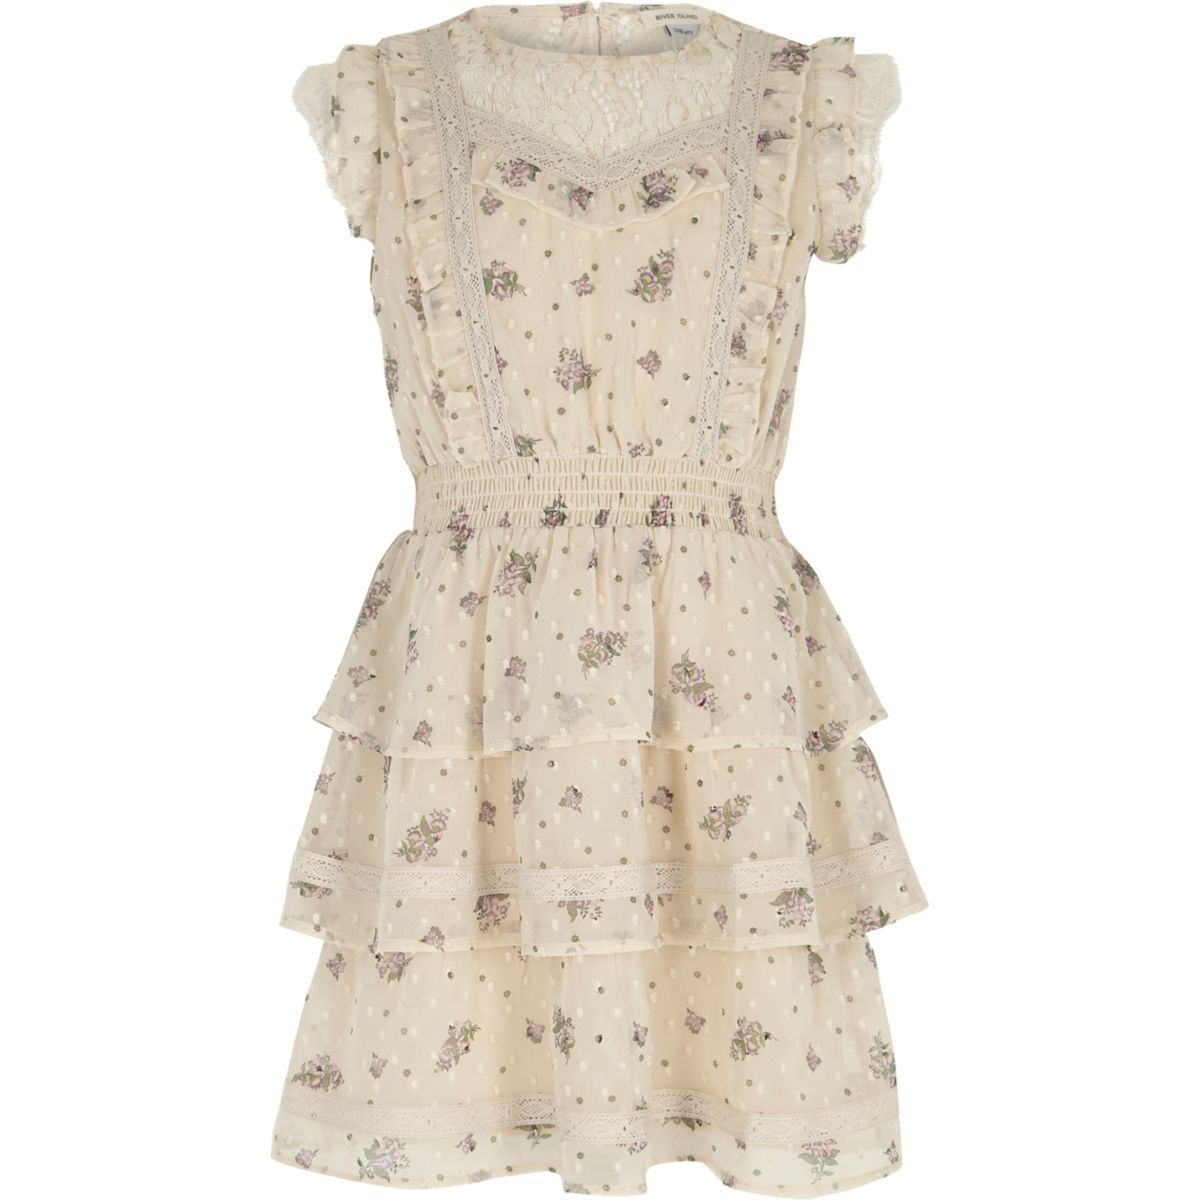 Girls cream floral lace trim frill dress